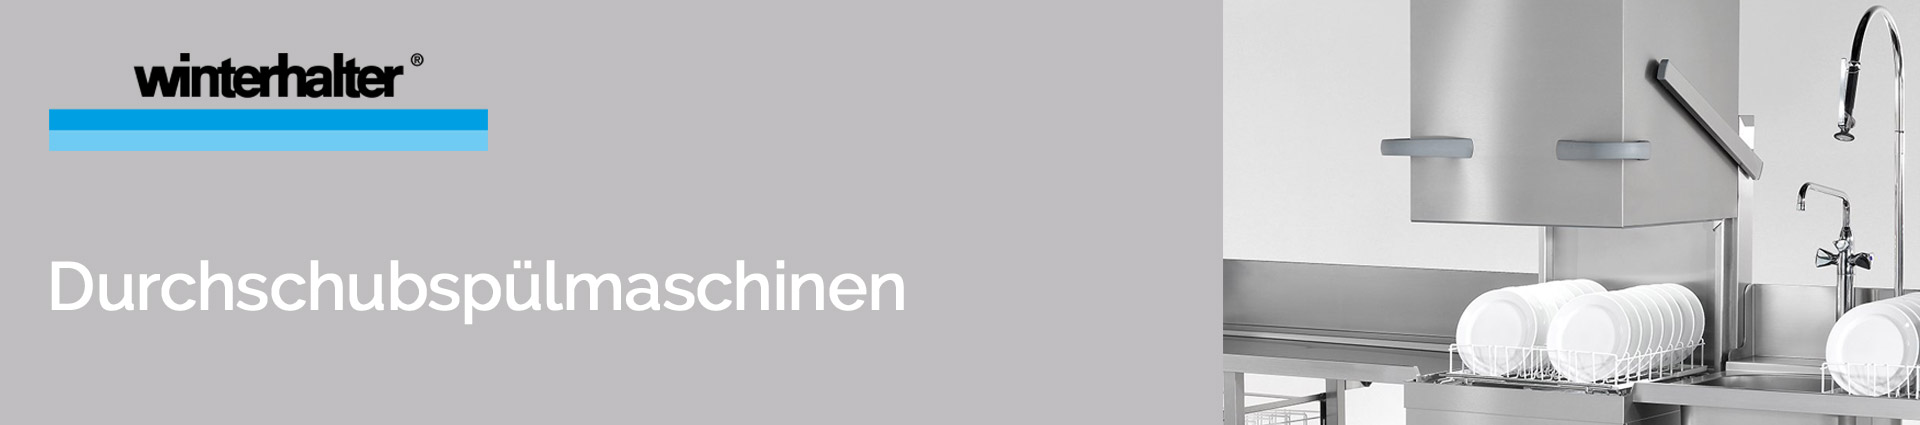 Winterhalter Durchschubspülmaschinen Banner